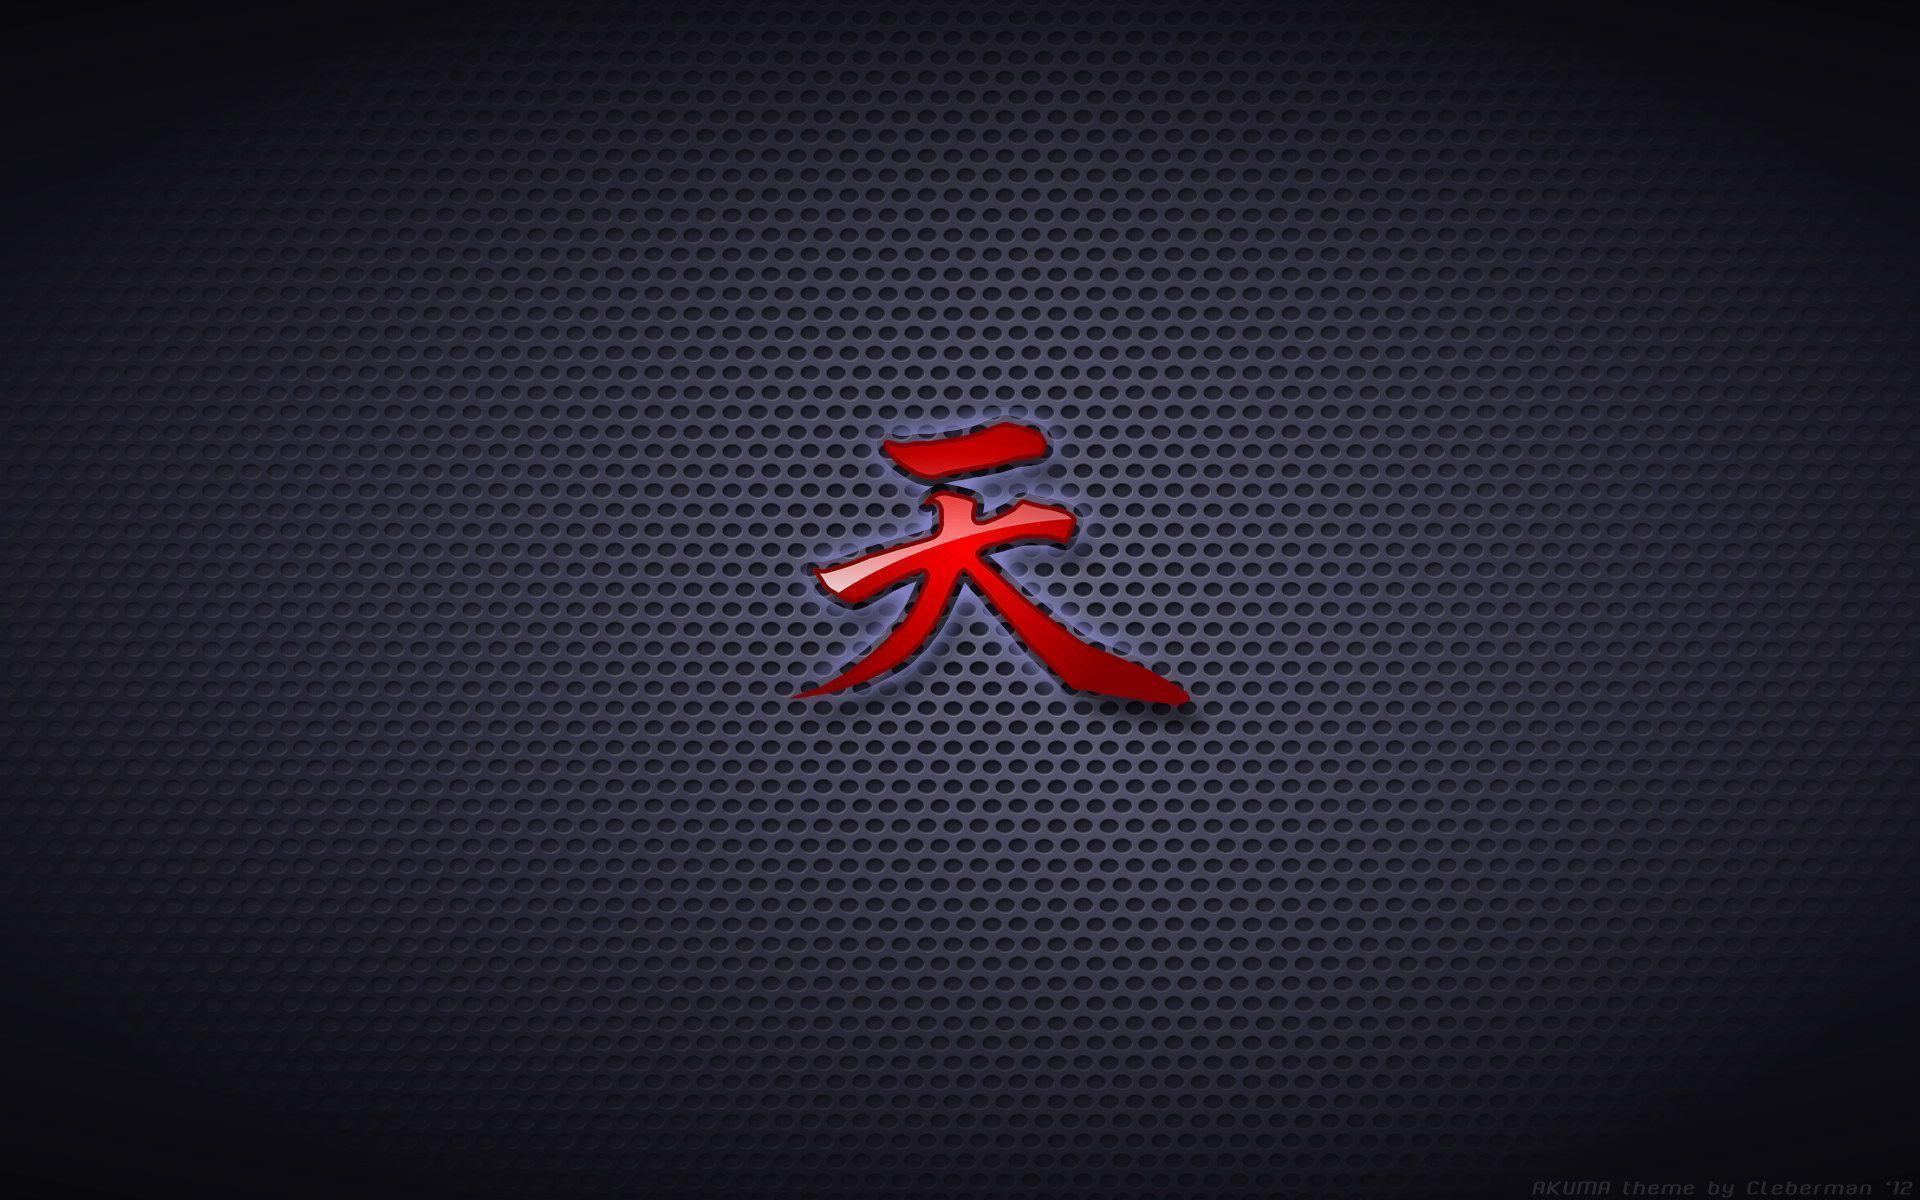 Logos For > Superhero Symbols Wallpaper